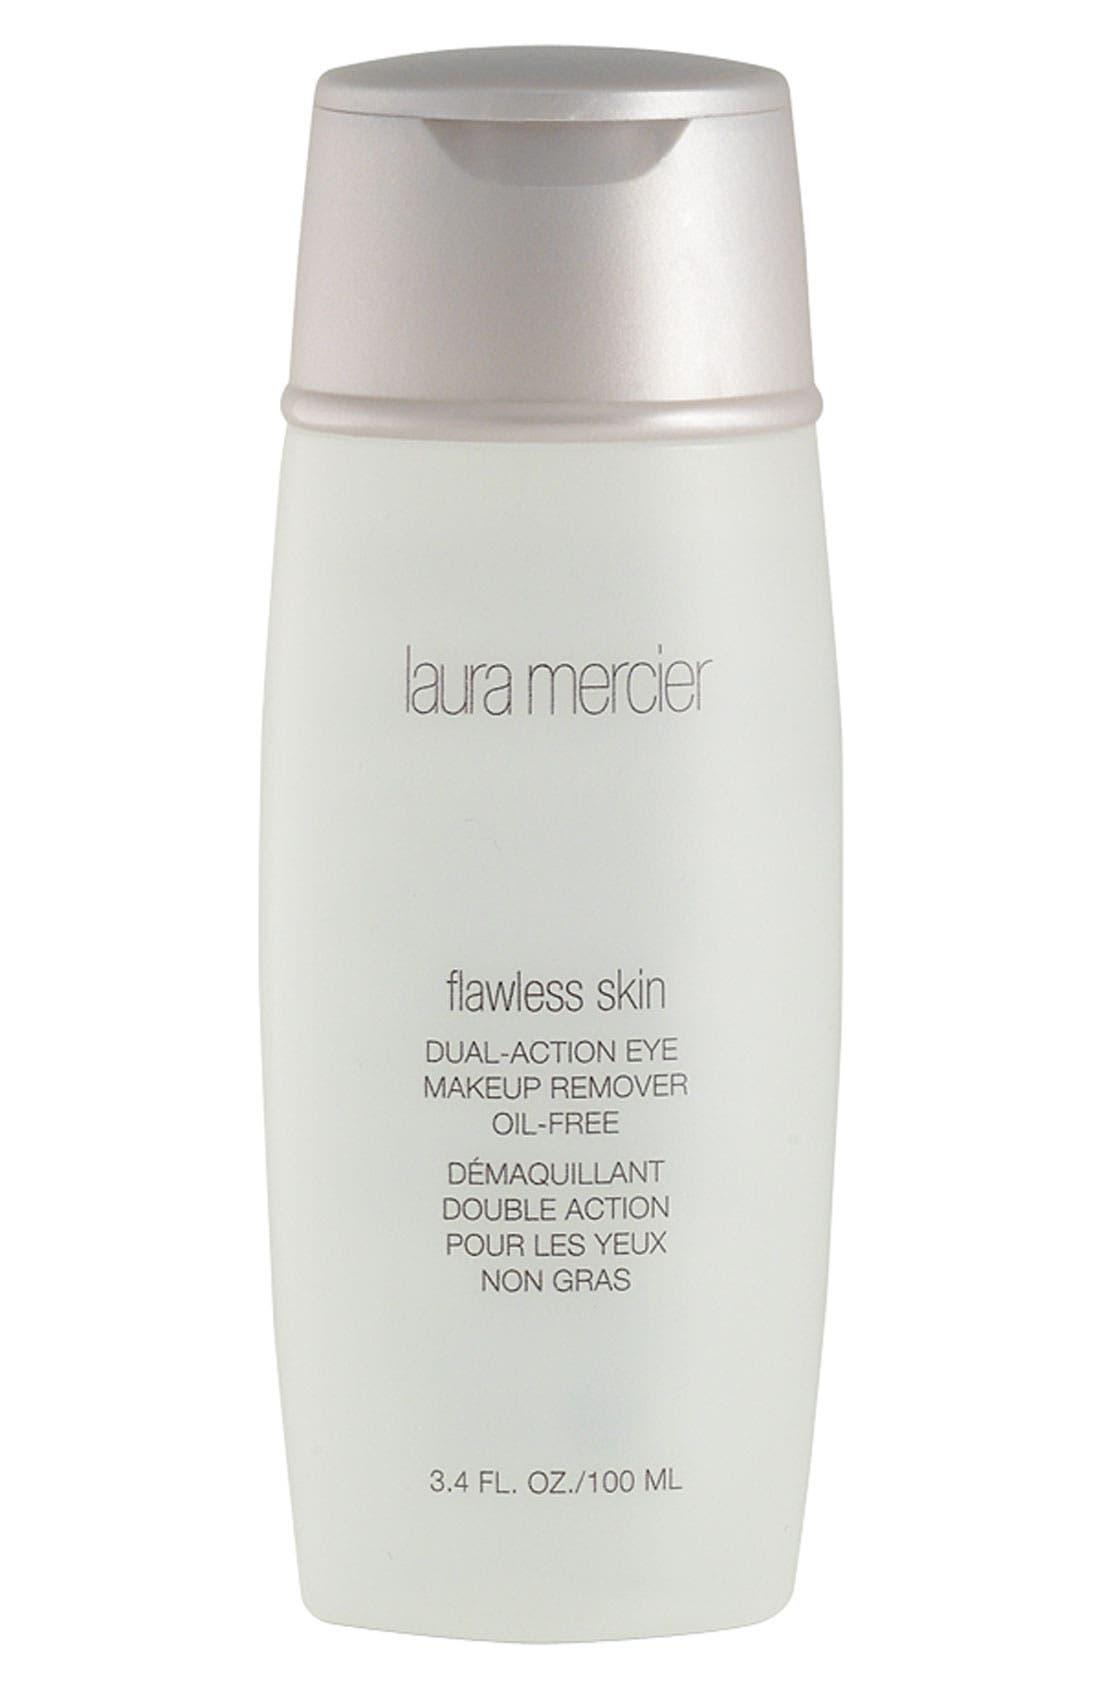 'Flawless Skin' Dual-Action Eye Makeup Remover,                             Main thumbnail 1, color,                             NO COLOR